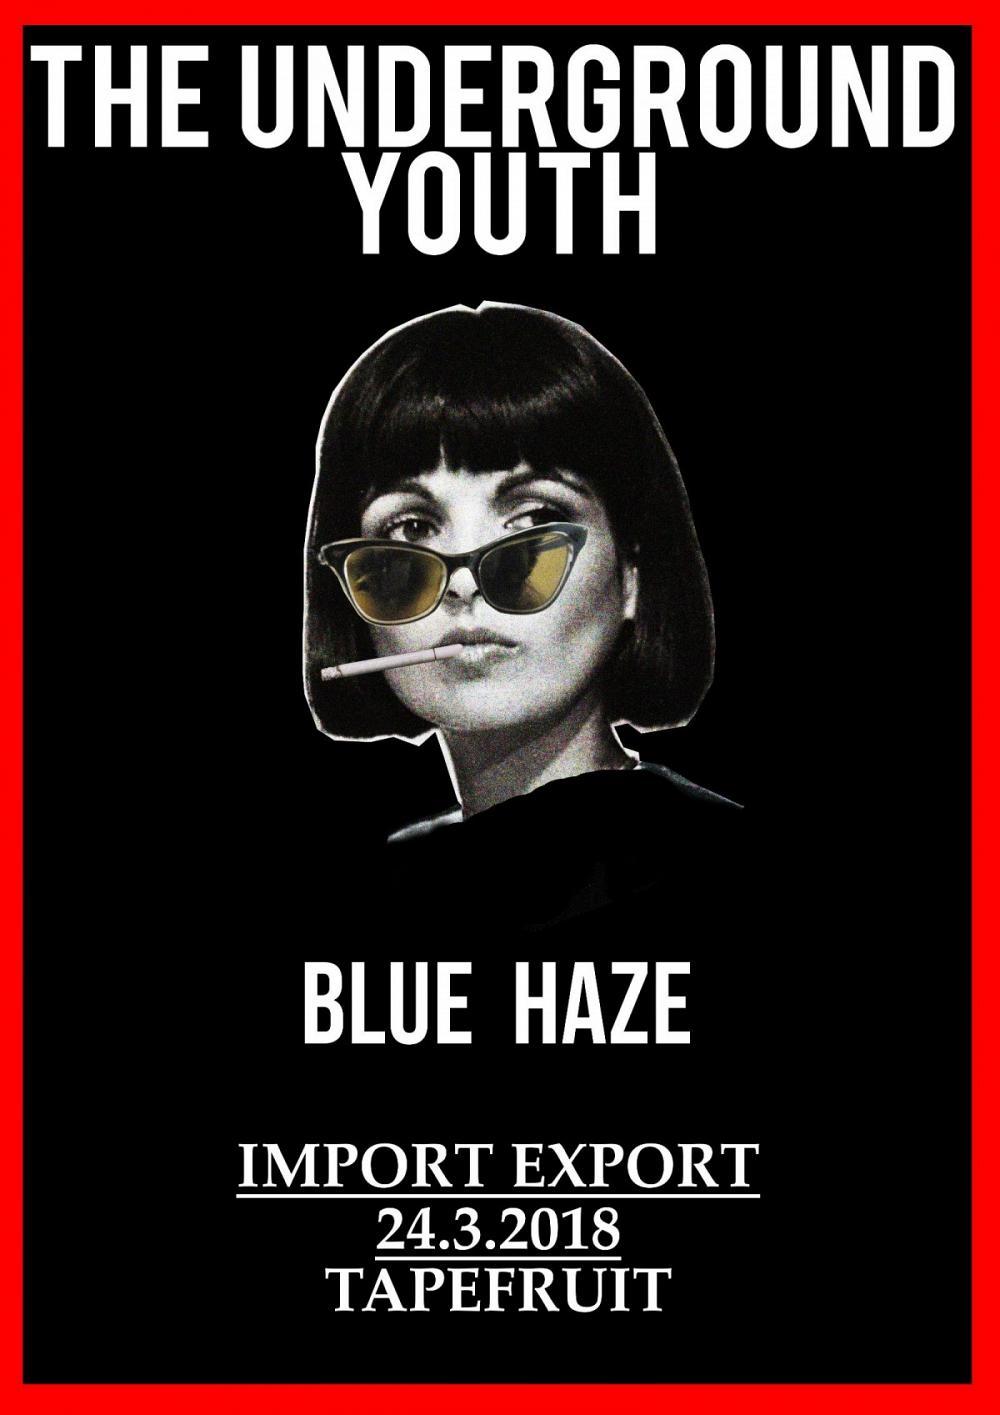 The Underground Youth + Blue Haze